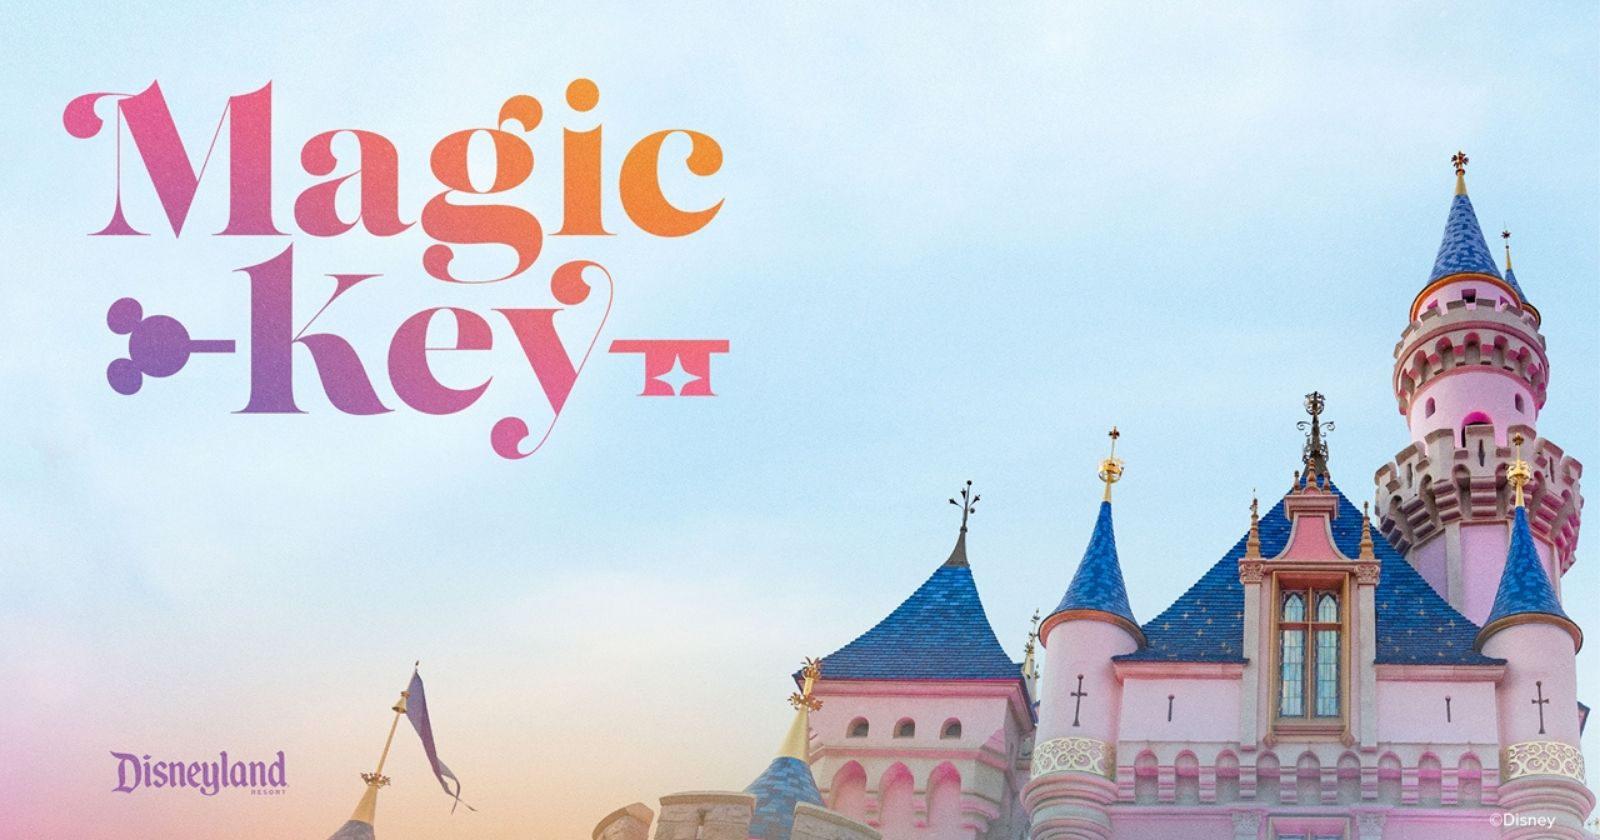 magic key text in sky over top of disneyland castle